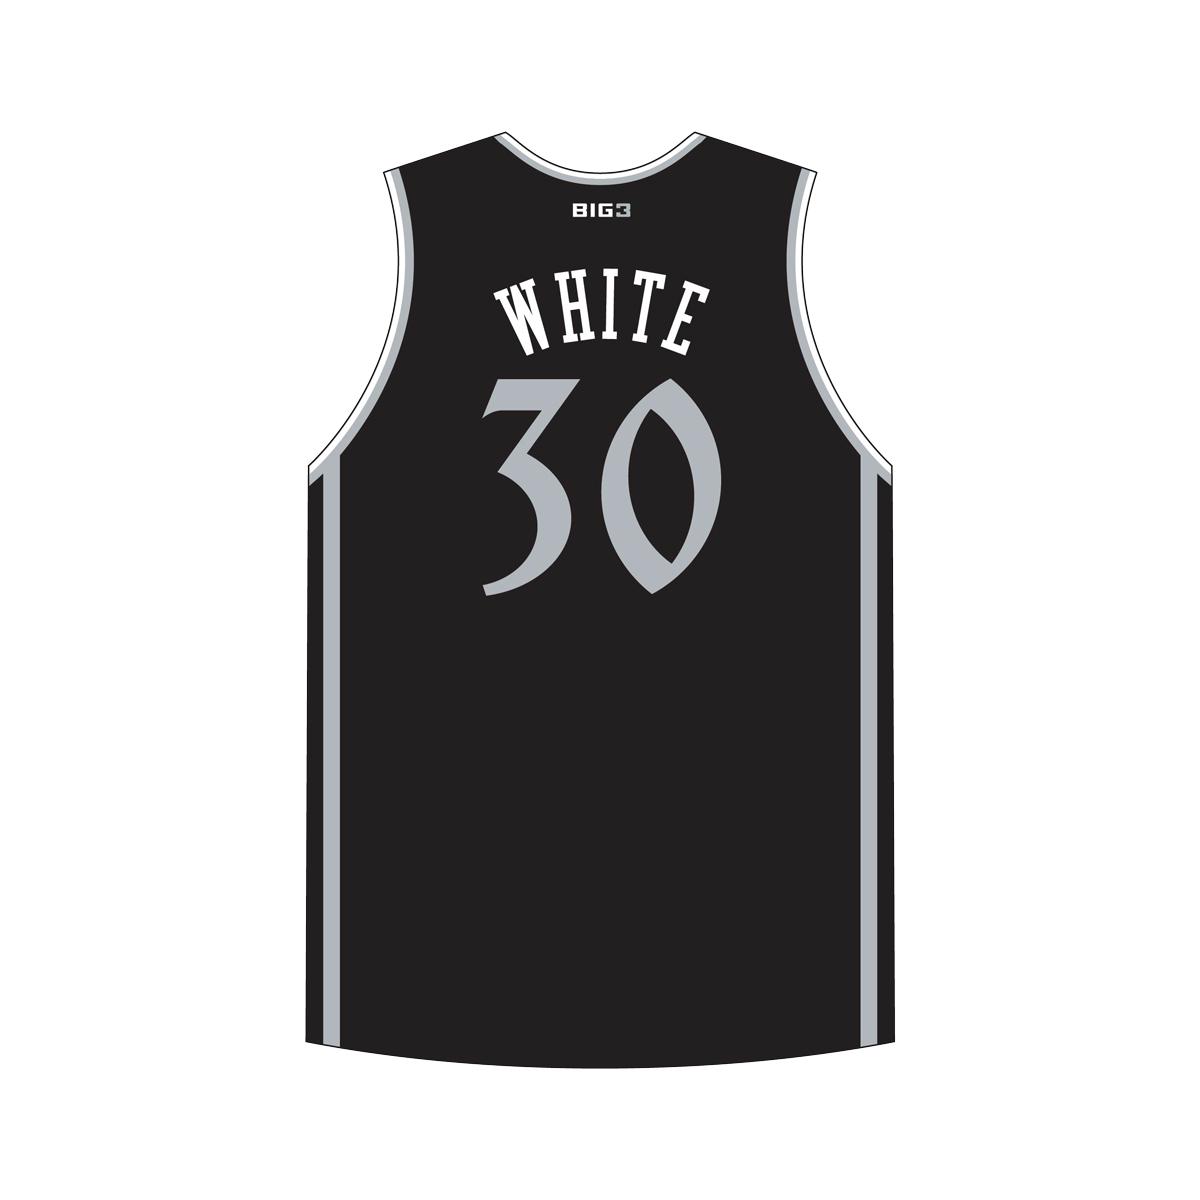 Royce White Jersey